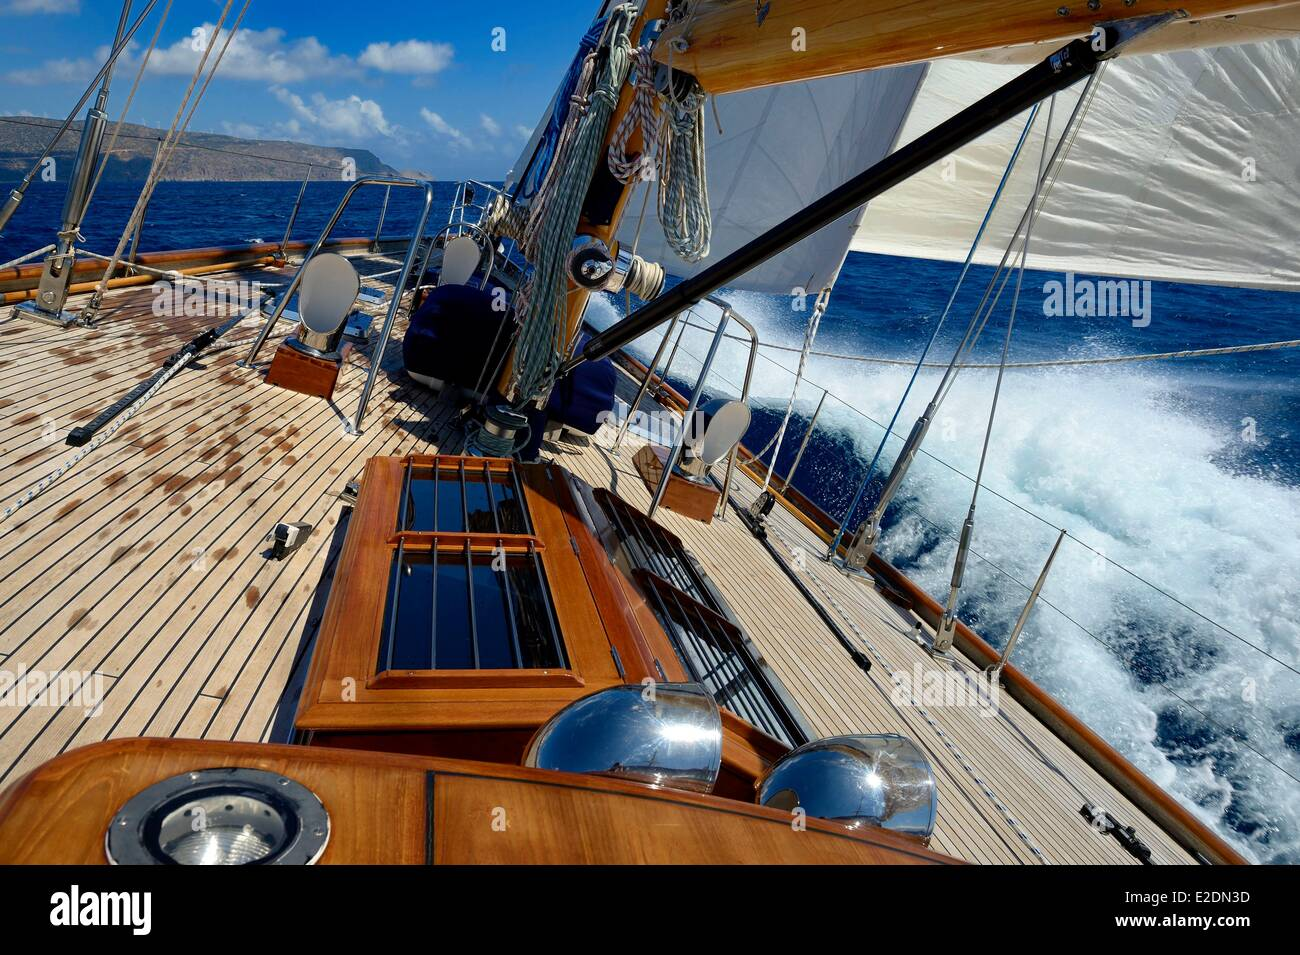 Greece Crete Agios Nikolaos region Elounda 22 meters sailing boat - Stock Image